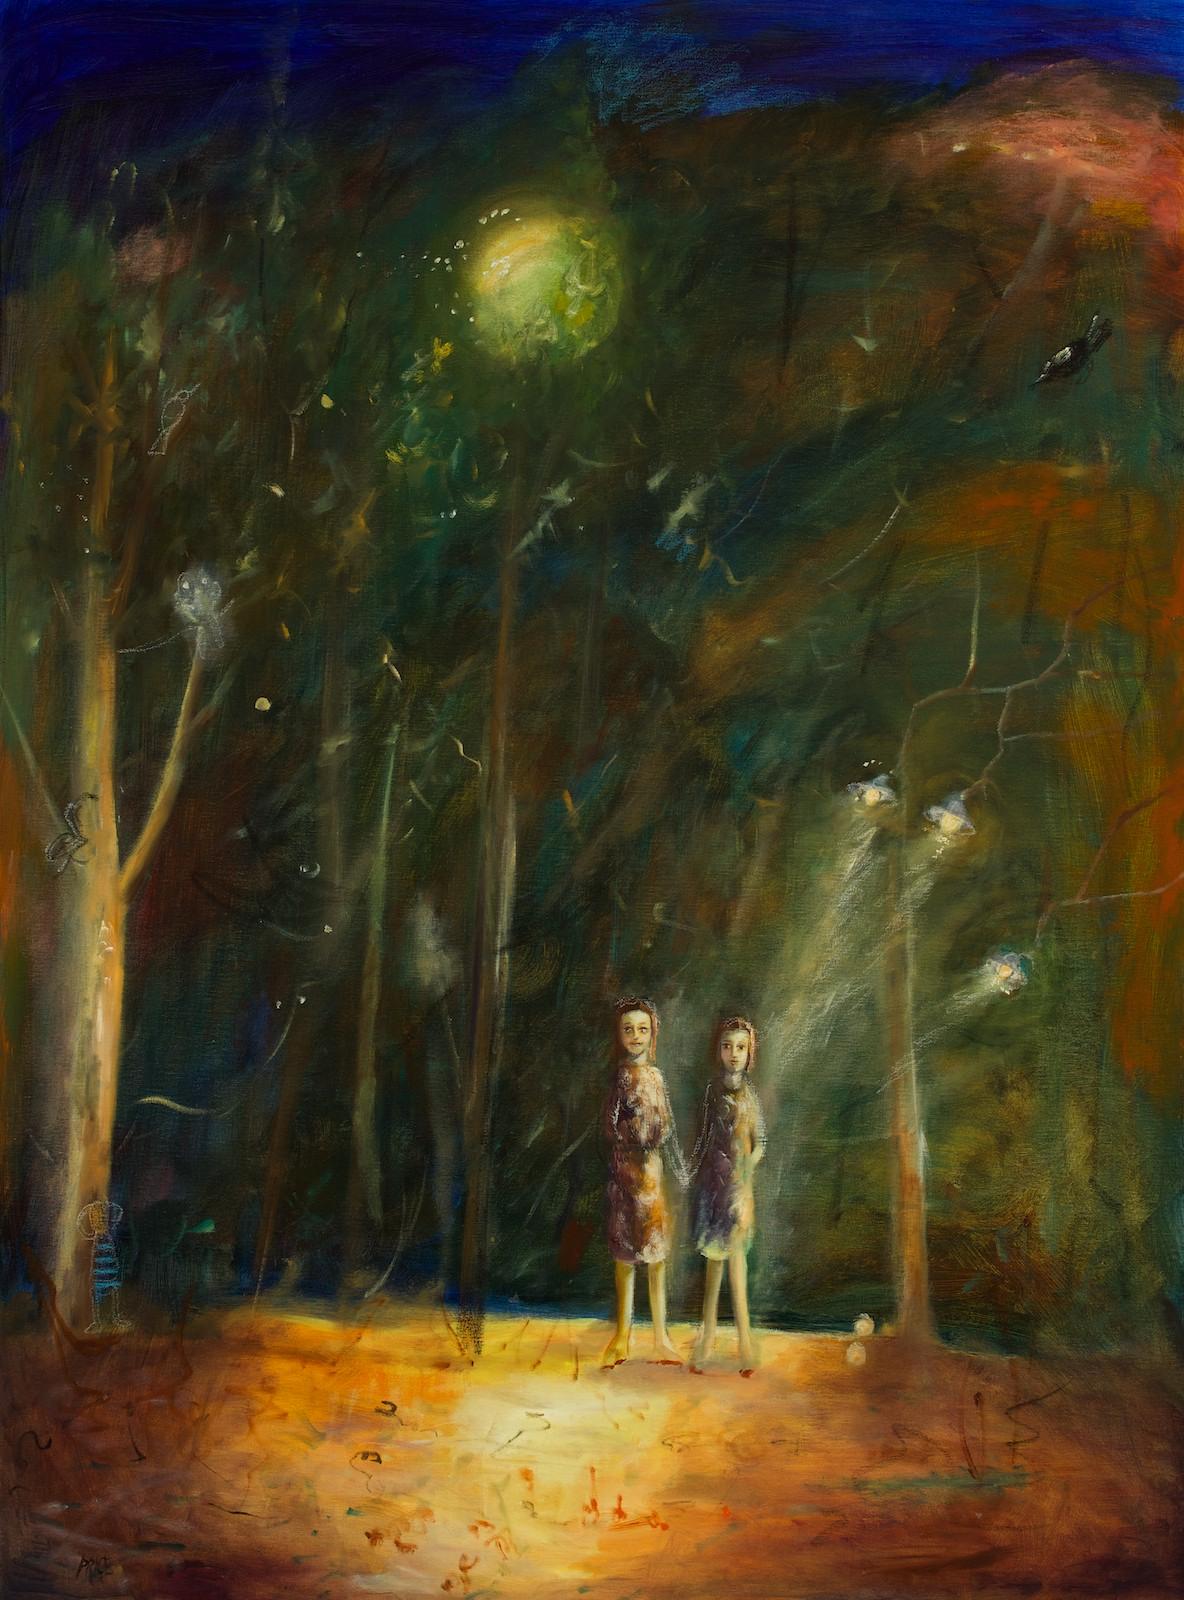 #13650 Terry Pauline Price 'Nightlights' 138cm x 103cm $7800